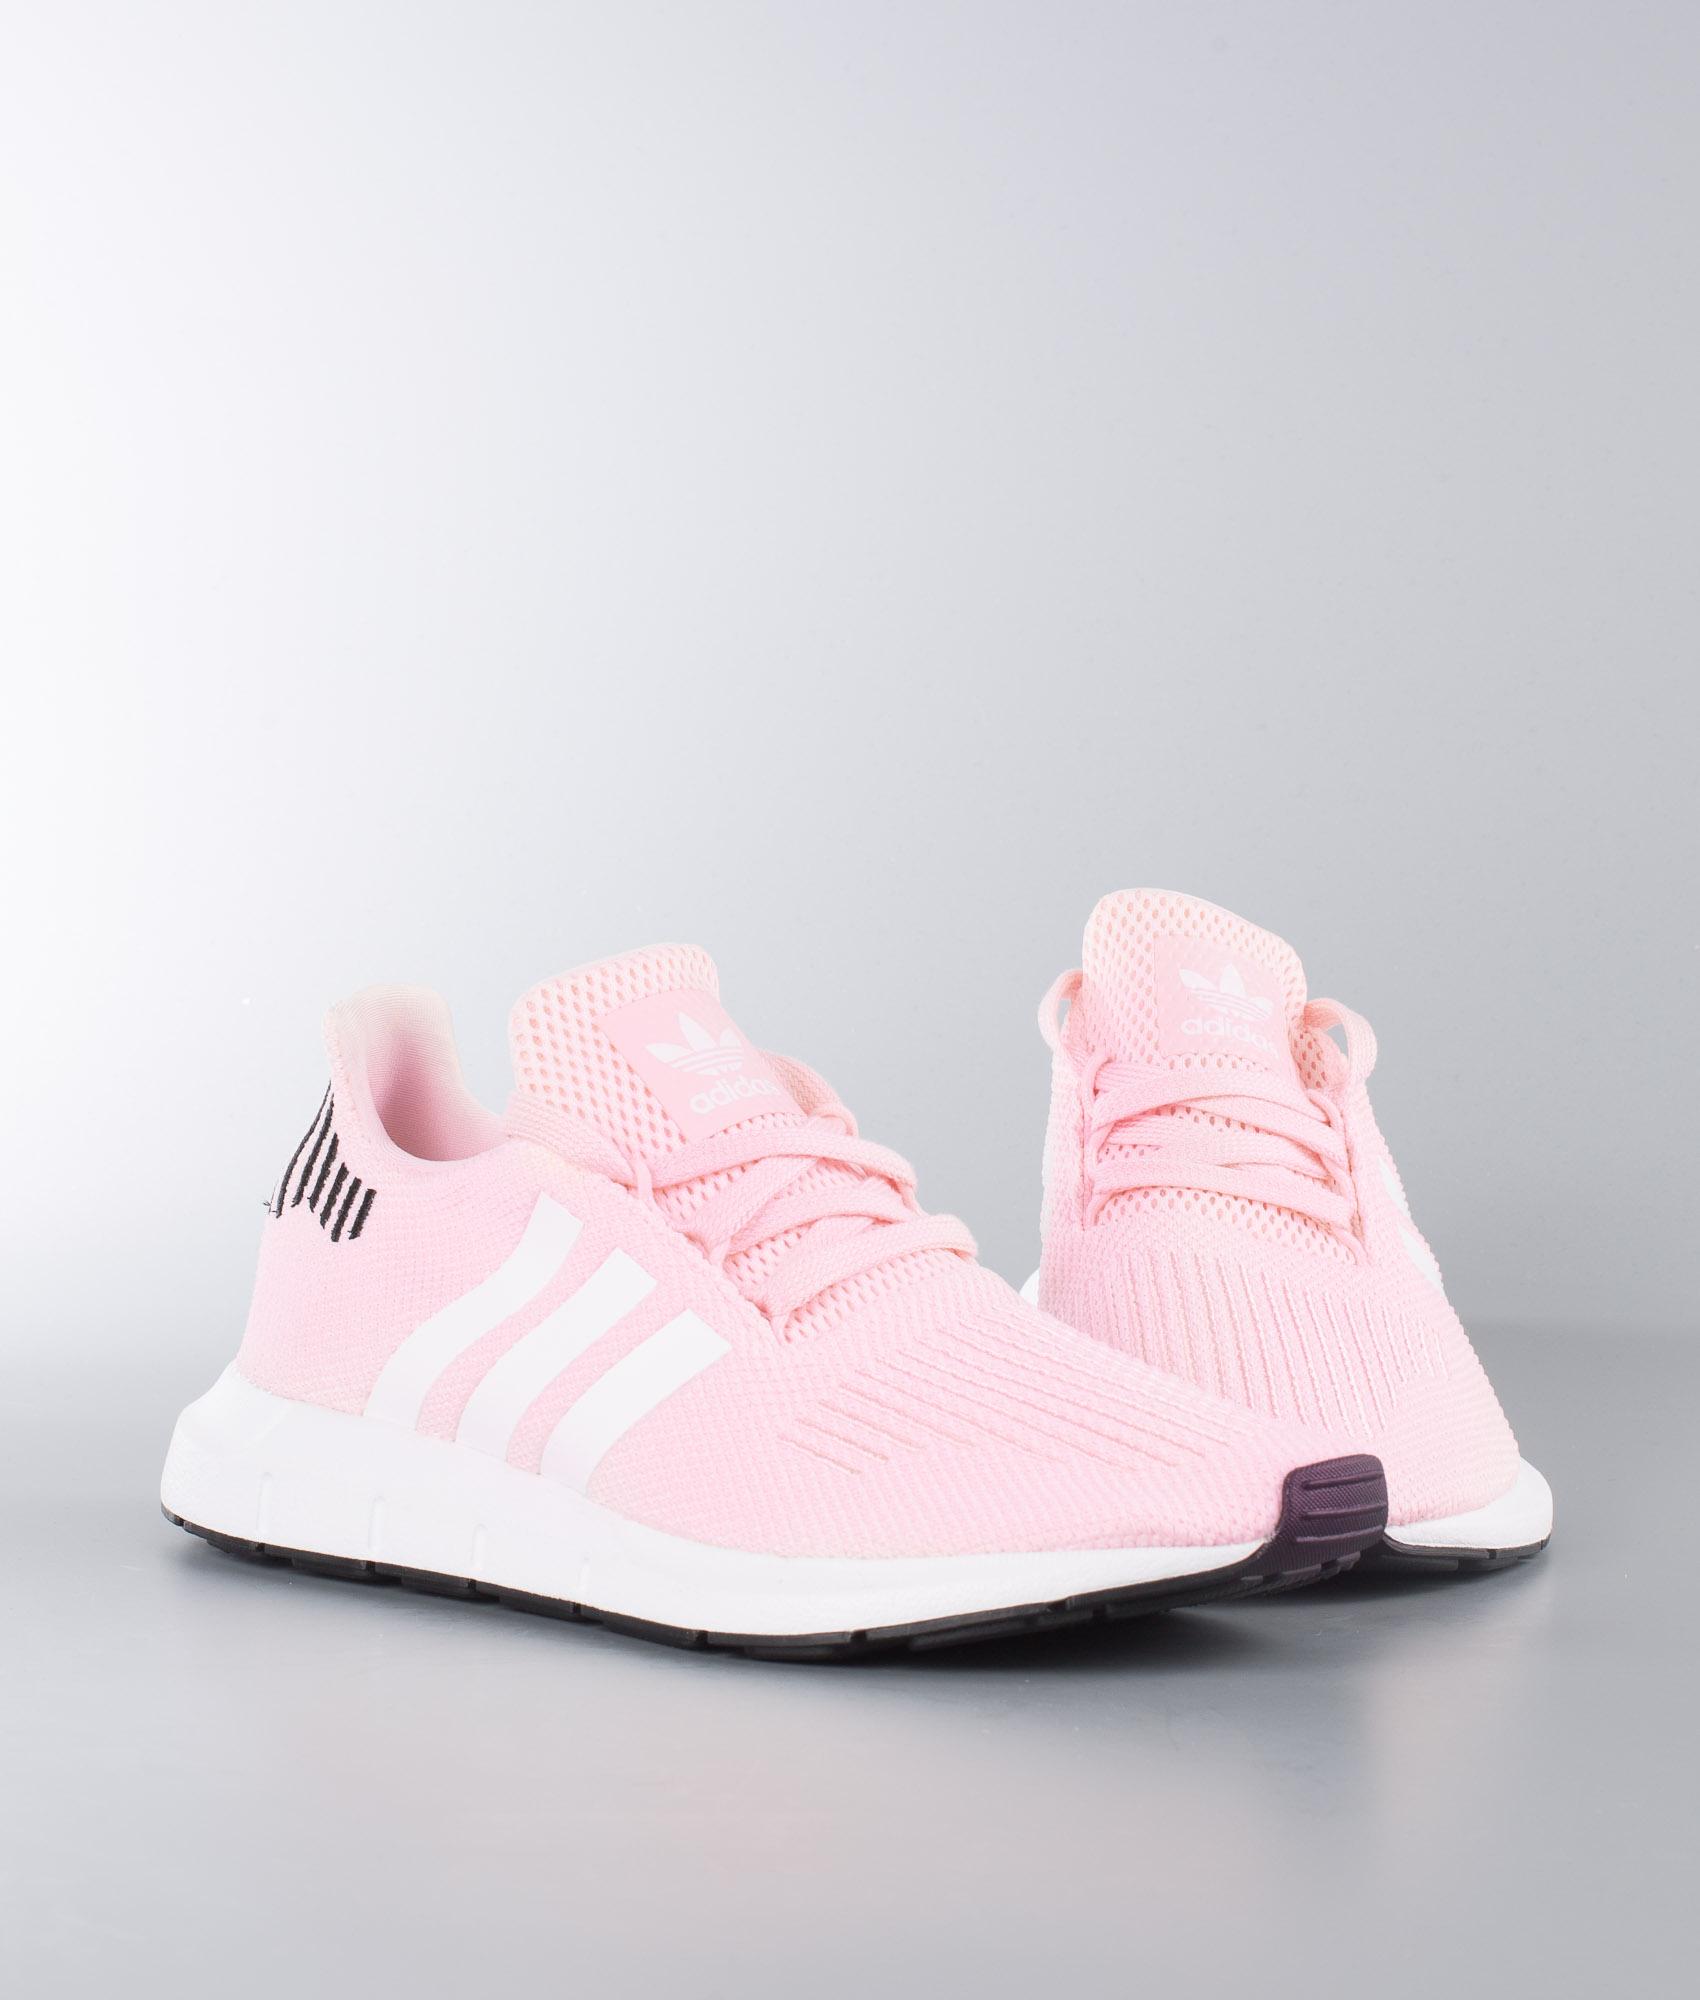 Schuhe Ice Pinkftwr Swift W Black Whitecore Run Adidas Originals OTPuikXZ